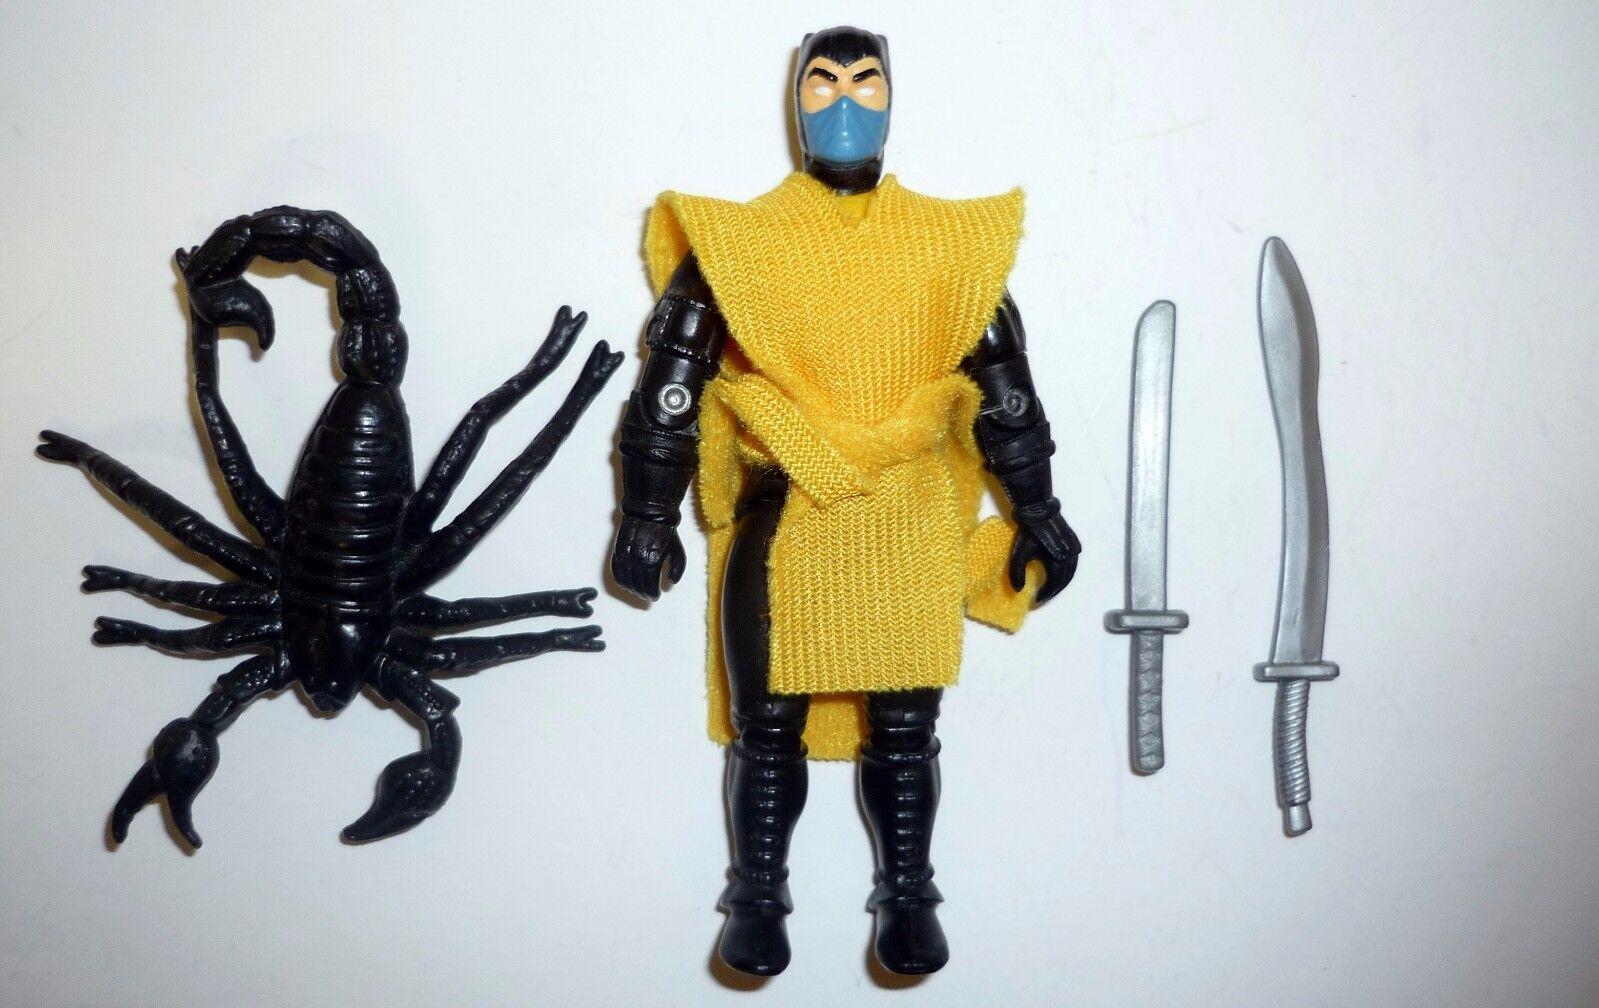 Mortal Kombat Scorpione Vintage Gi Joe Action Figure Completo C9 1994